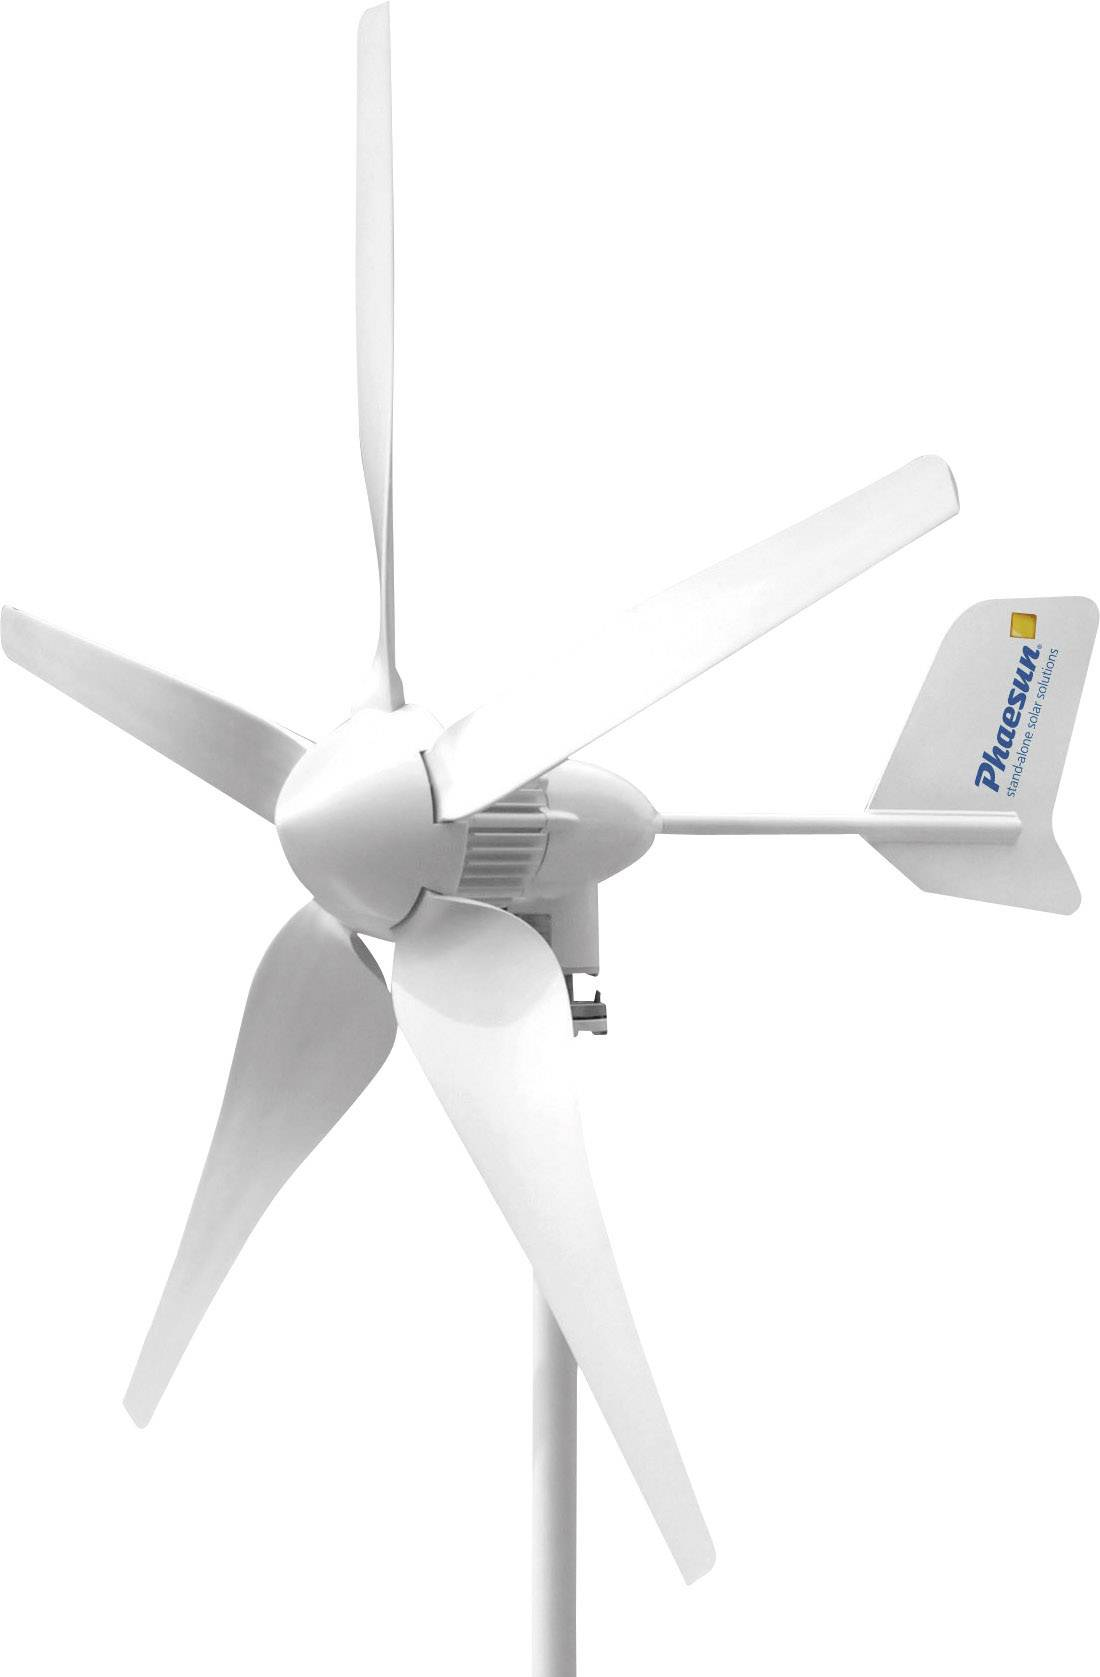 Větrný generátor pro mini elektrárnu Phaesun Stormy Wings HY-400-12 310125, výkon při (10m/s) 400 W